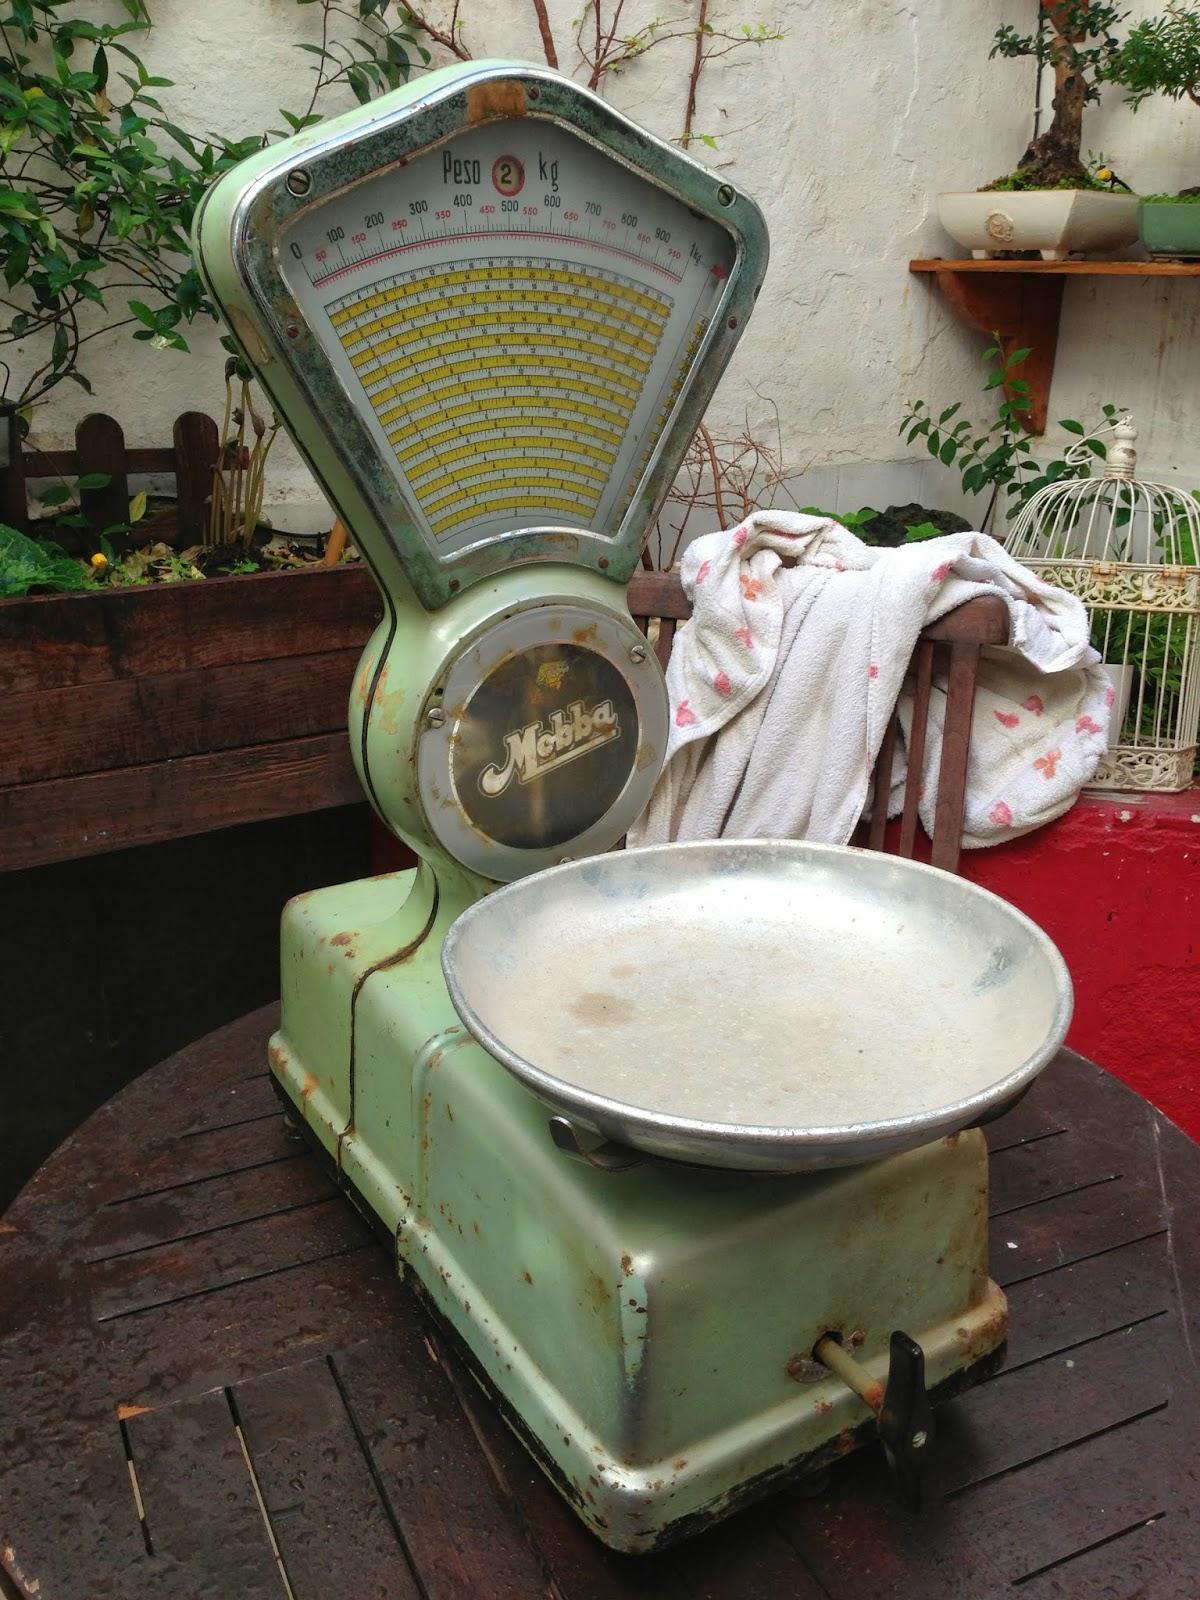 Bascula Baño Vintage:Diy: Restaurando dos básculas antiguas – Paperblog